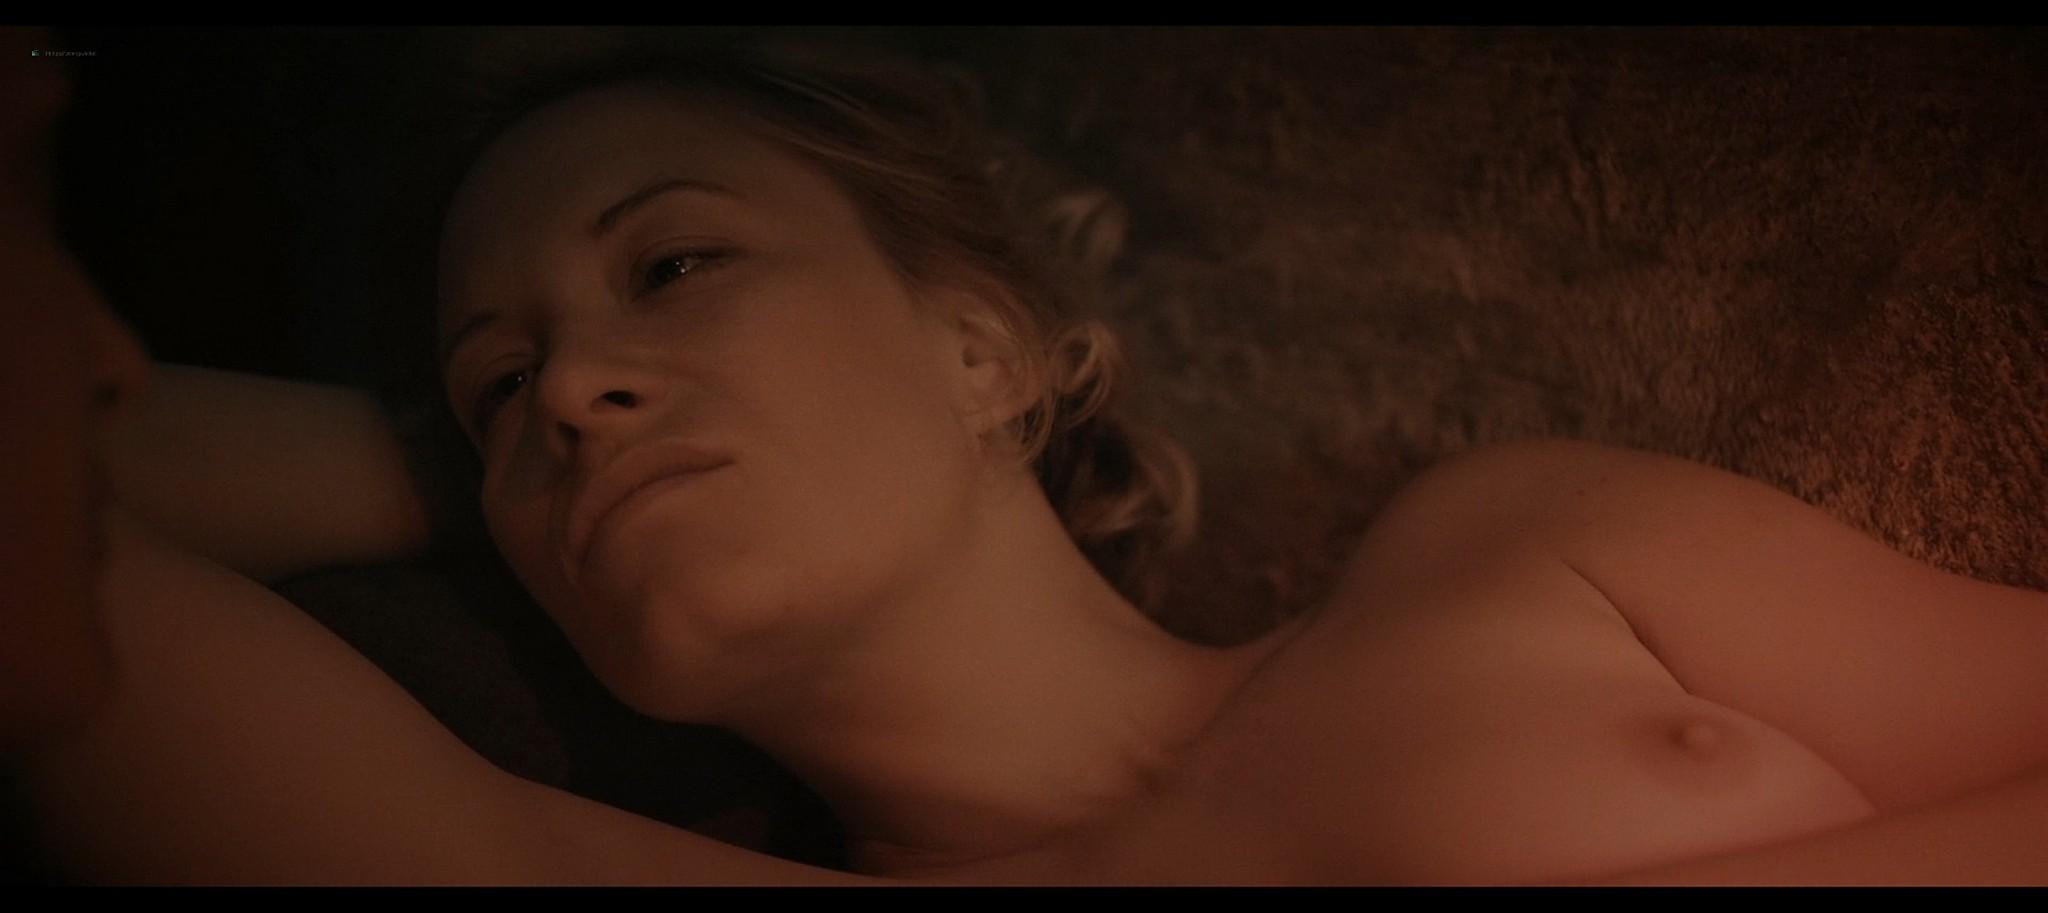 Clemence Thioly nude sex Helena Dvorakova nude lesbian sex Colette 2013 1080p BluRay 11